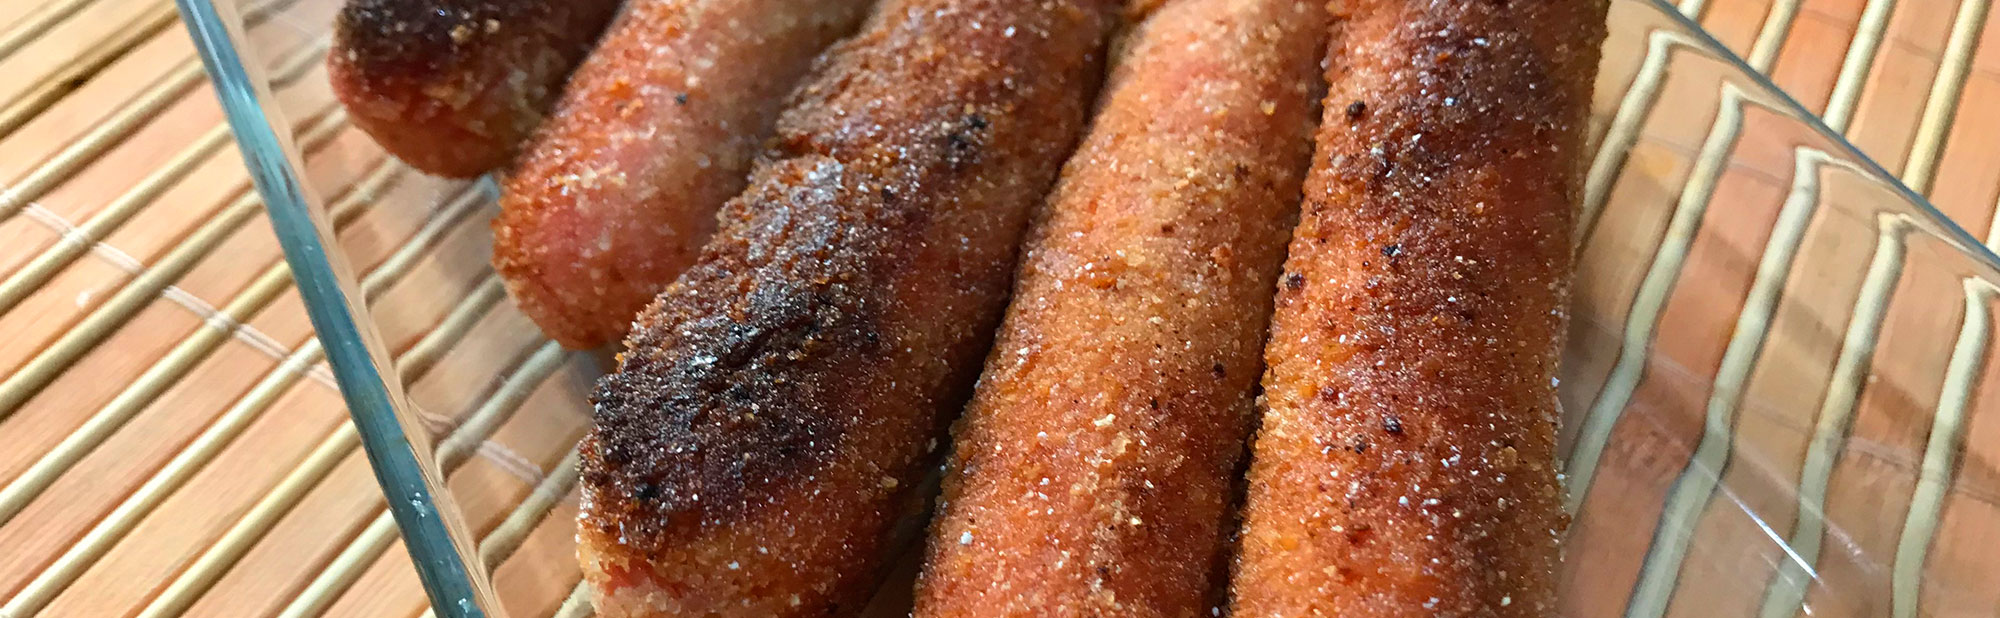 La Antojadera | Salchichas Empanizadas